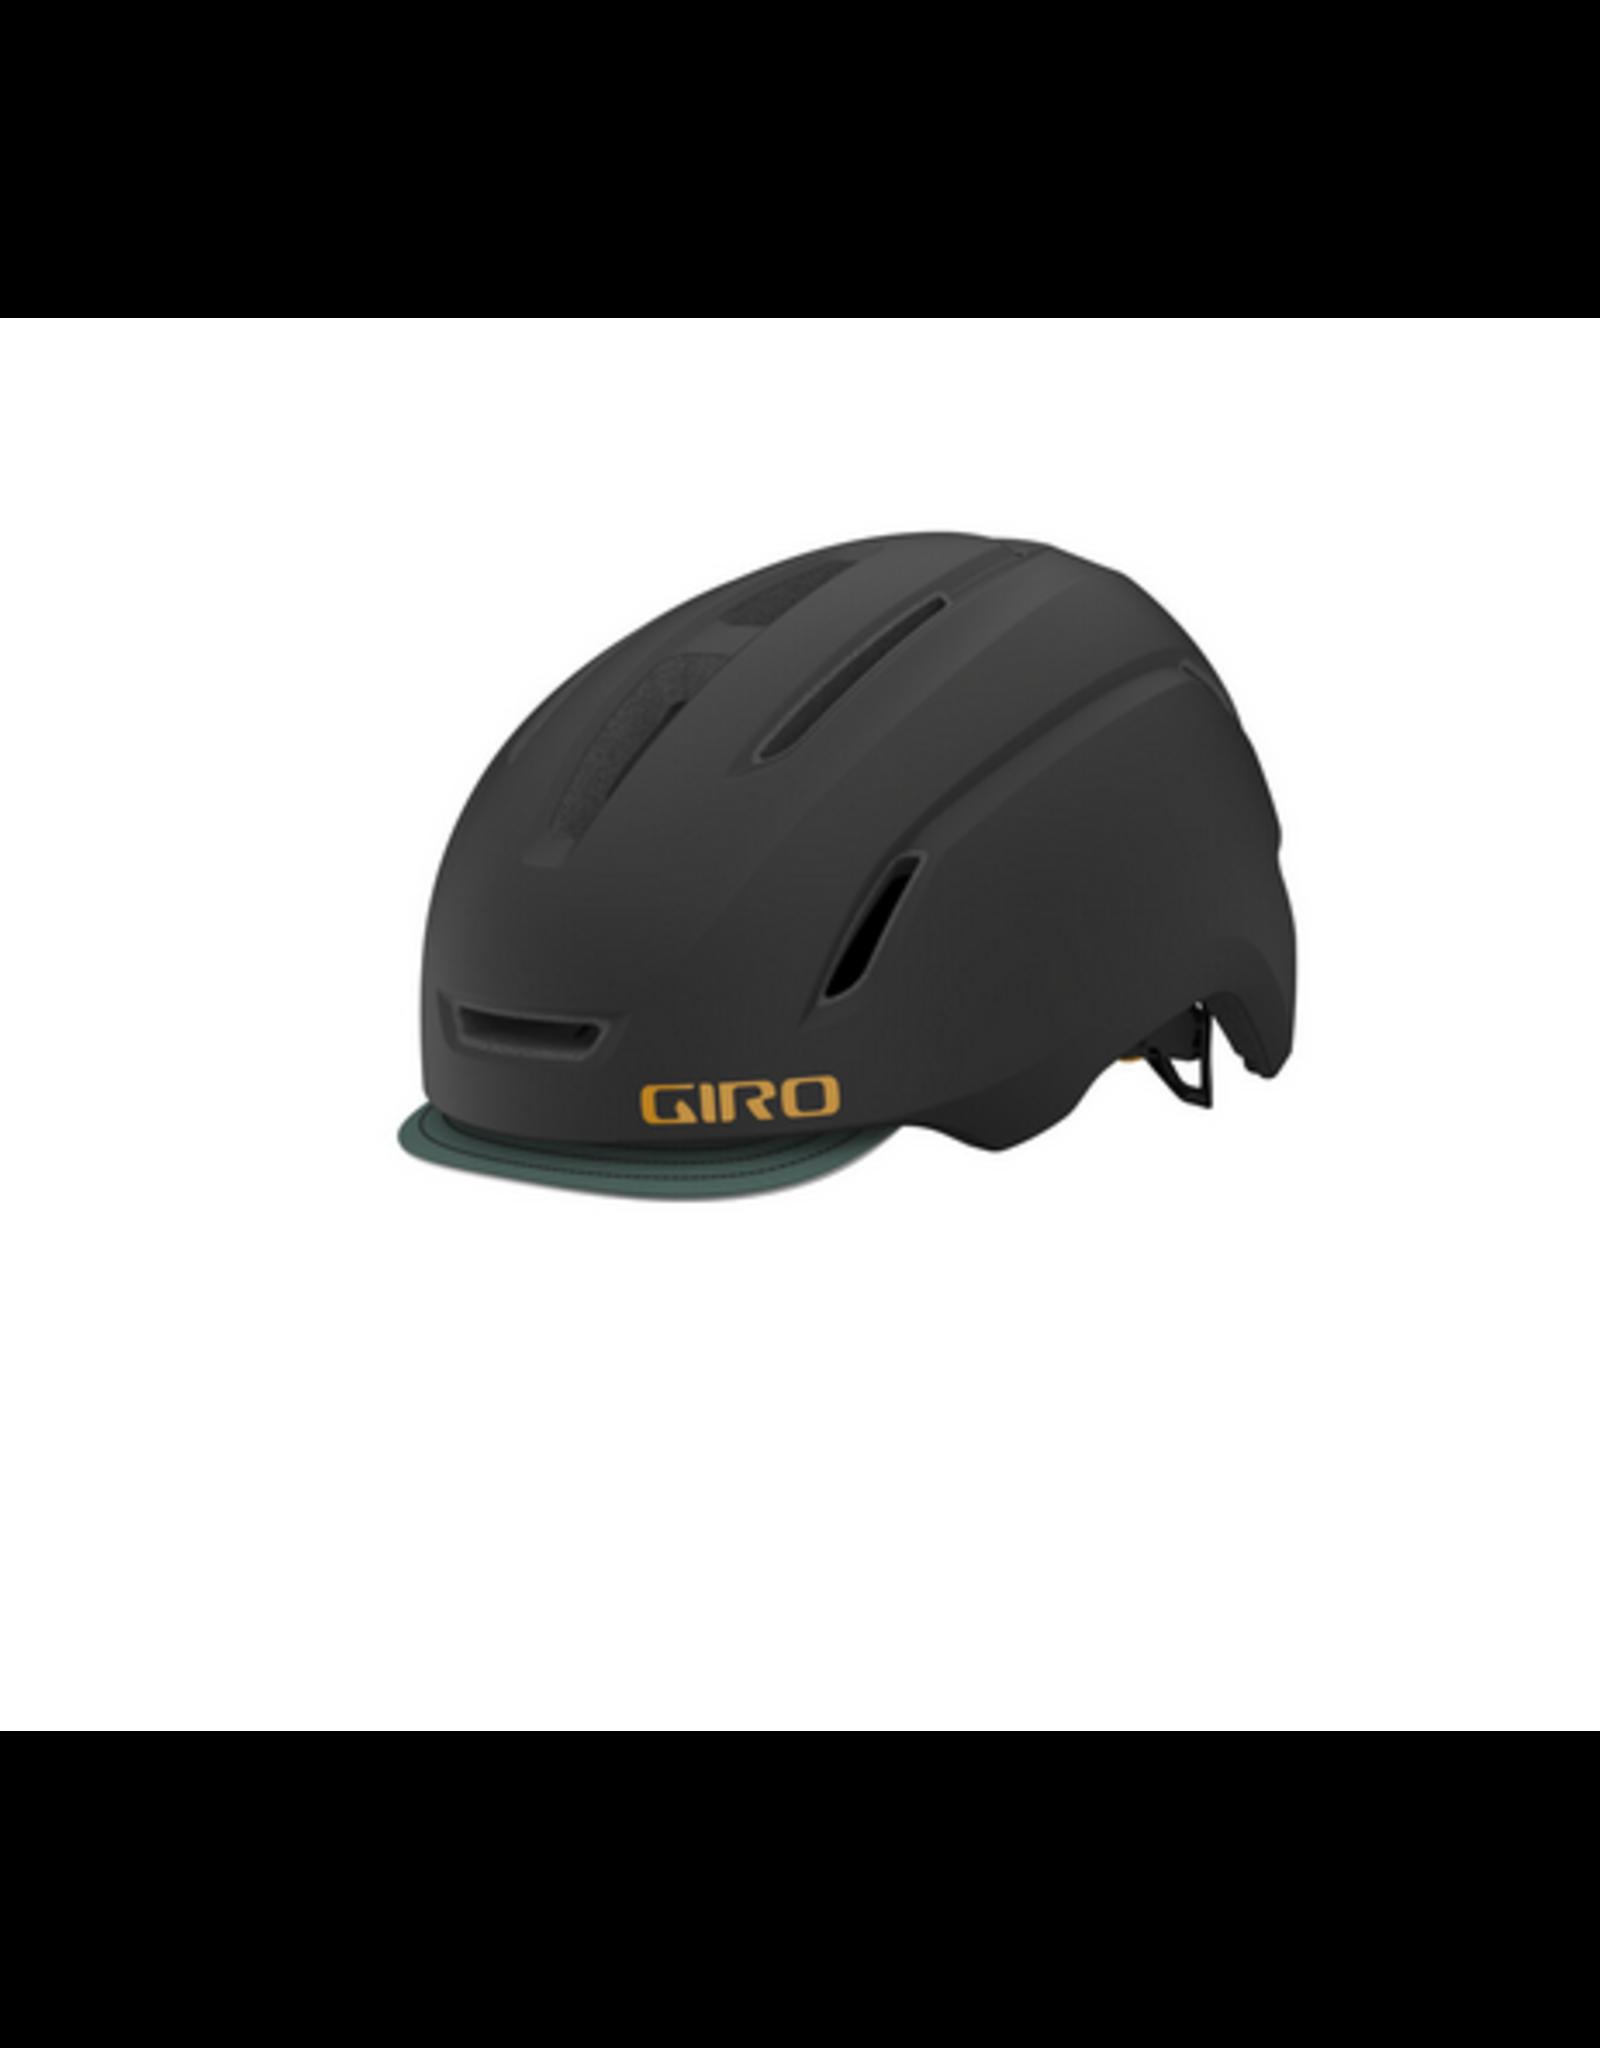 Giro Giro Caden Standard Helmet